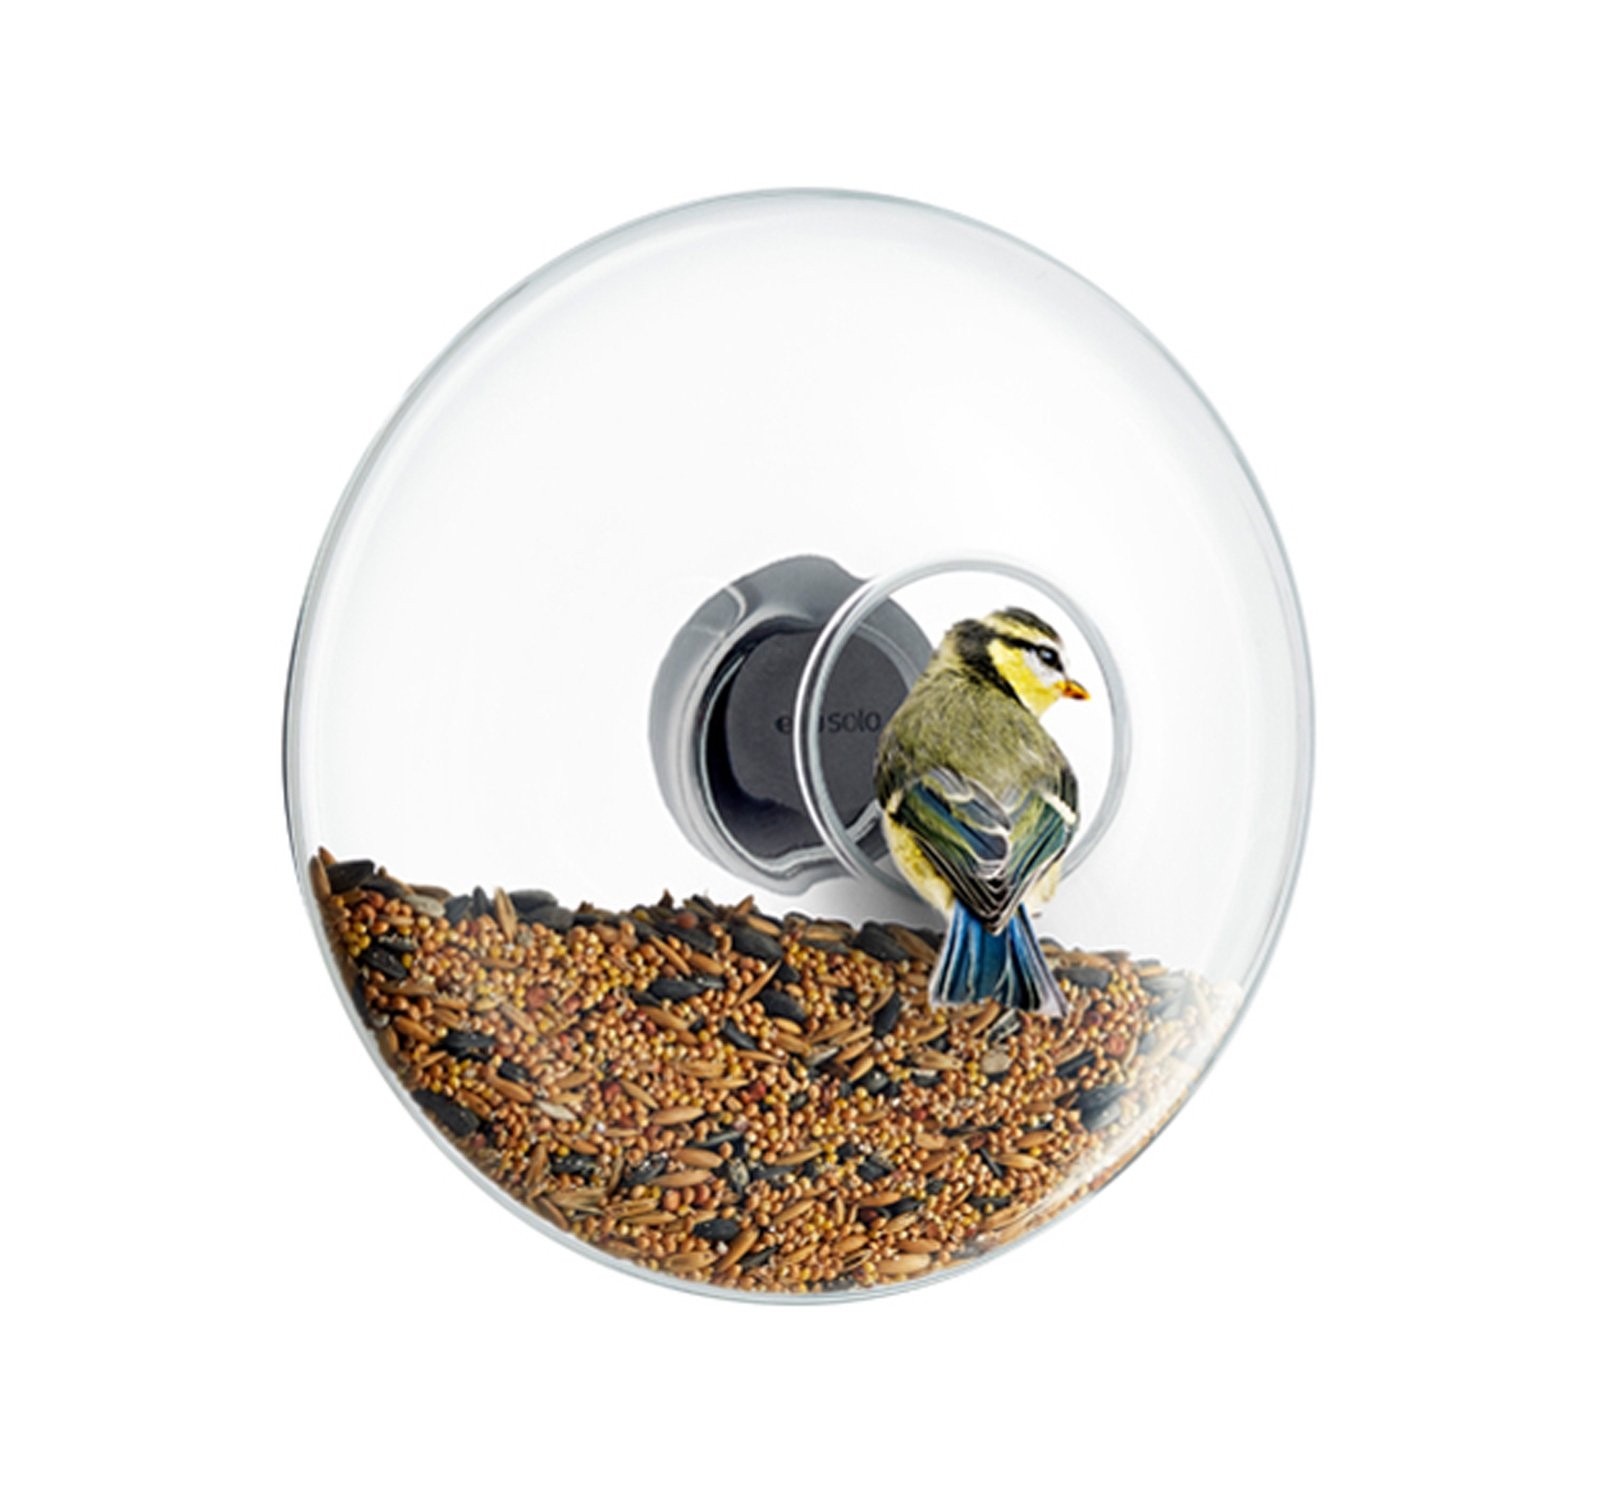 Eva Solo - Window Bird Feeder - (Large) by Eva Solo (Image #1)